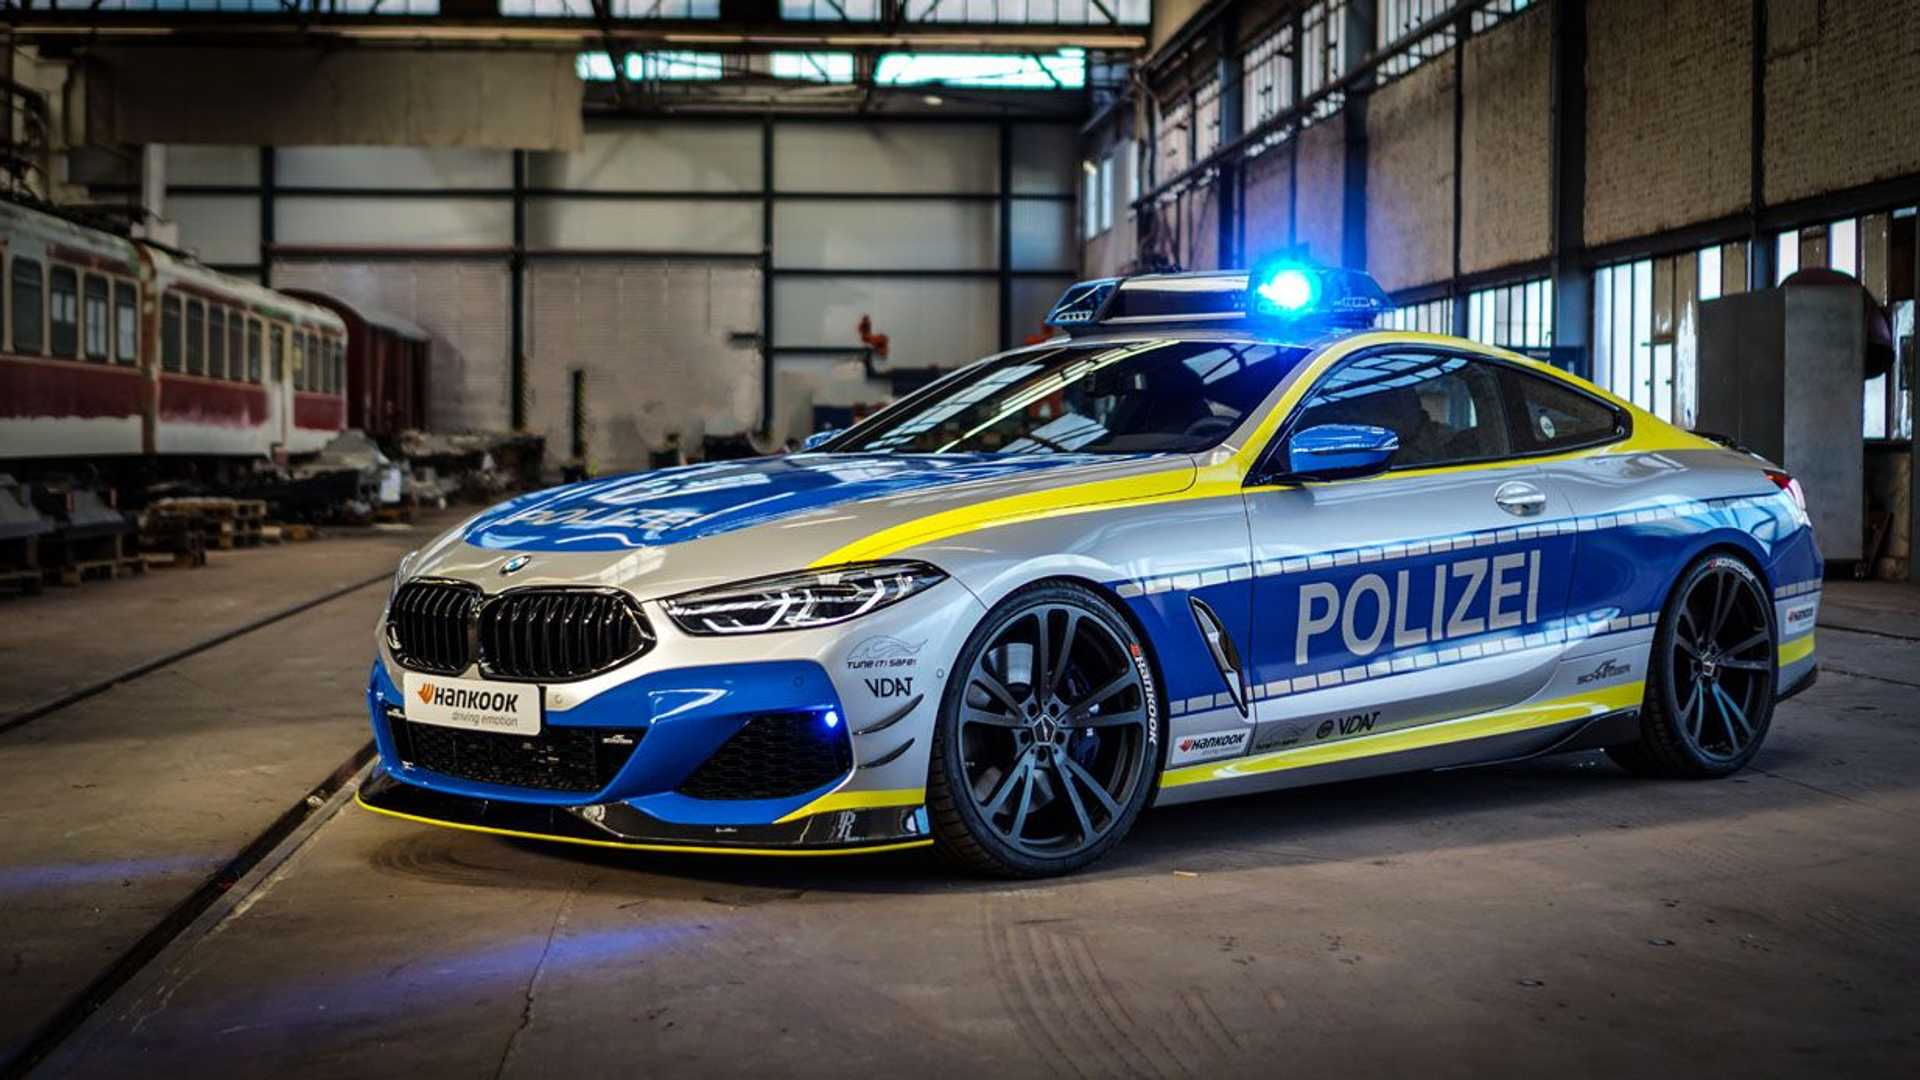 BMW-M850i-police-car-tune-it-safe-8